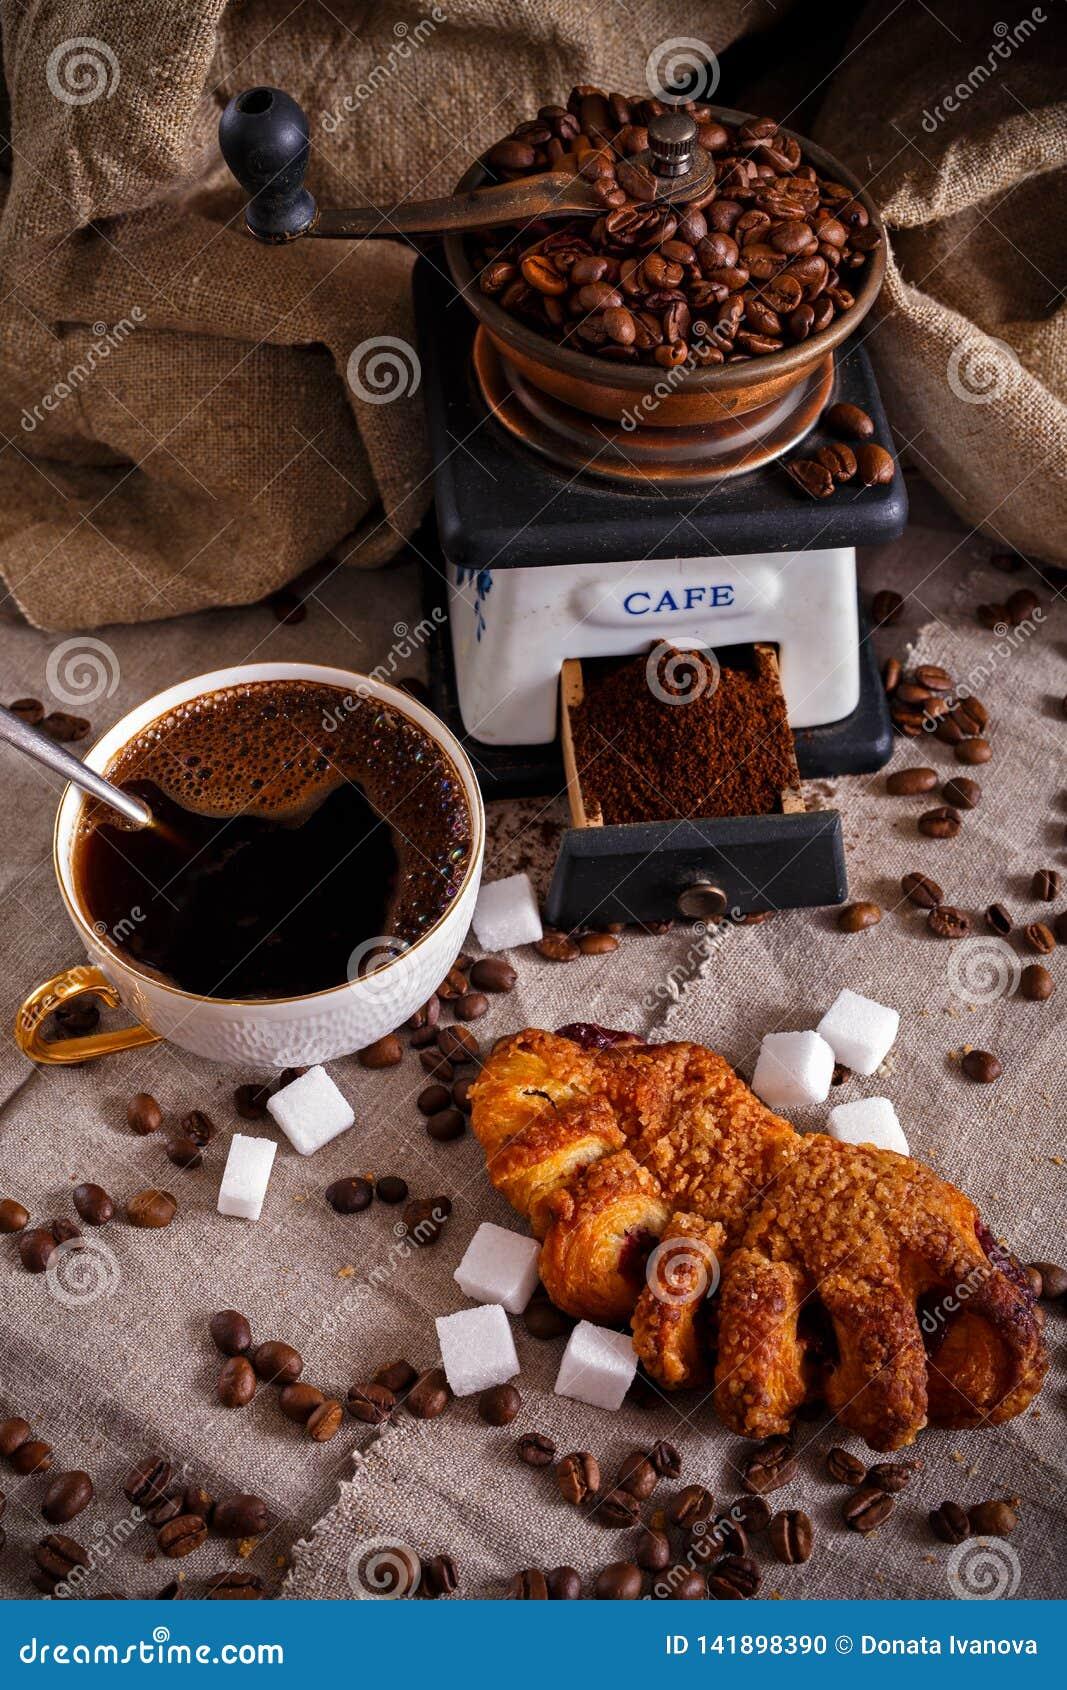 Una tazza di caffè nero con una ciambellina salata, un mulino di caffè ed i chicchi di caffè sparsi su una tavola coperta di tela